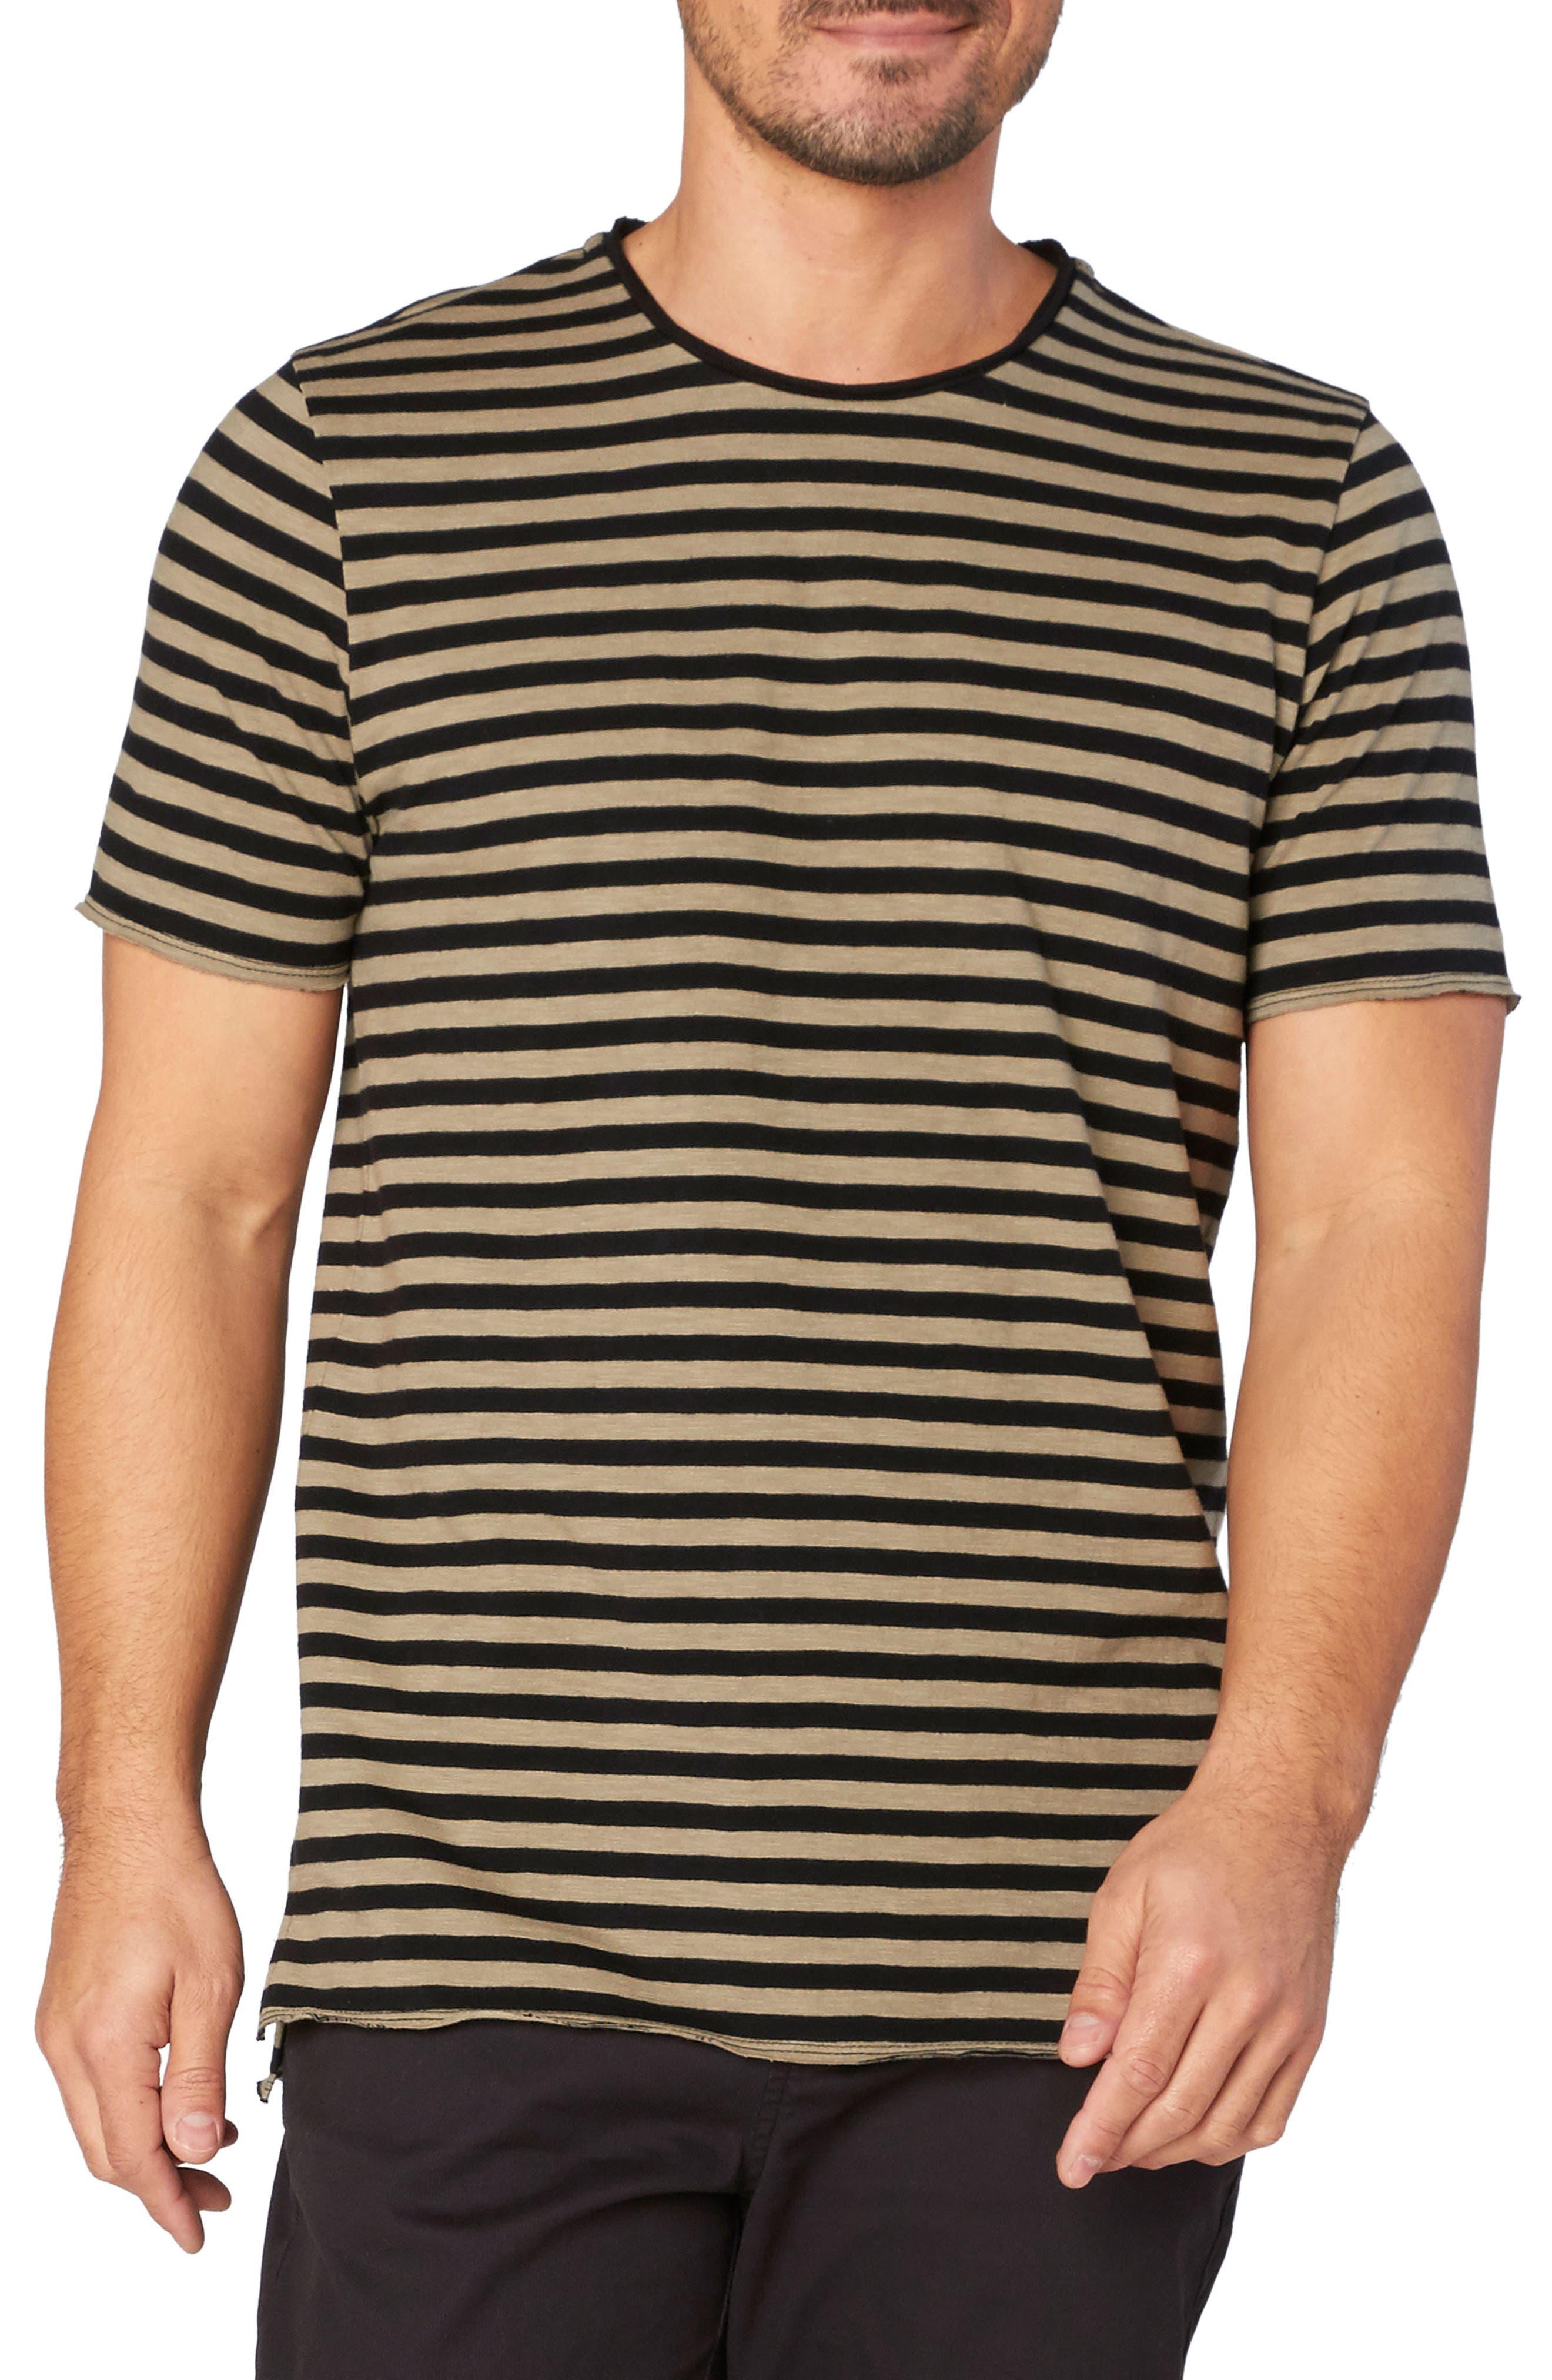 Kane Slub Stripe T-Shirt,                         Main,                         color, Brindle